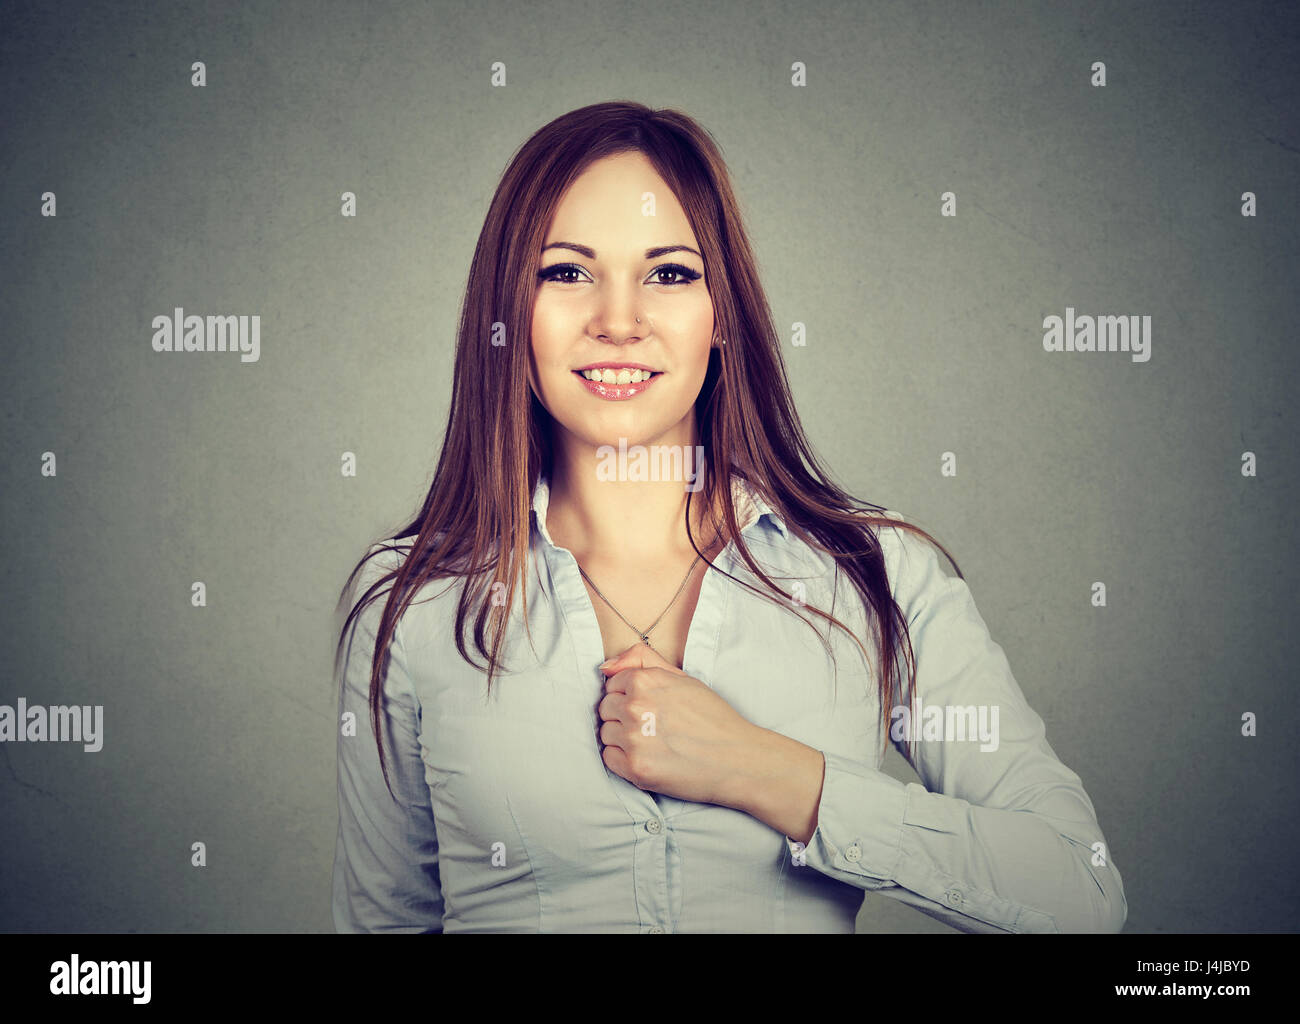 Seguro joven determinado para un cambio aislado sobre fondo gris Imagen De Stock